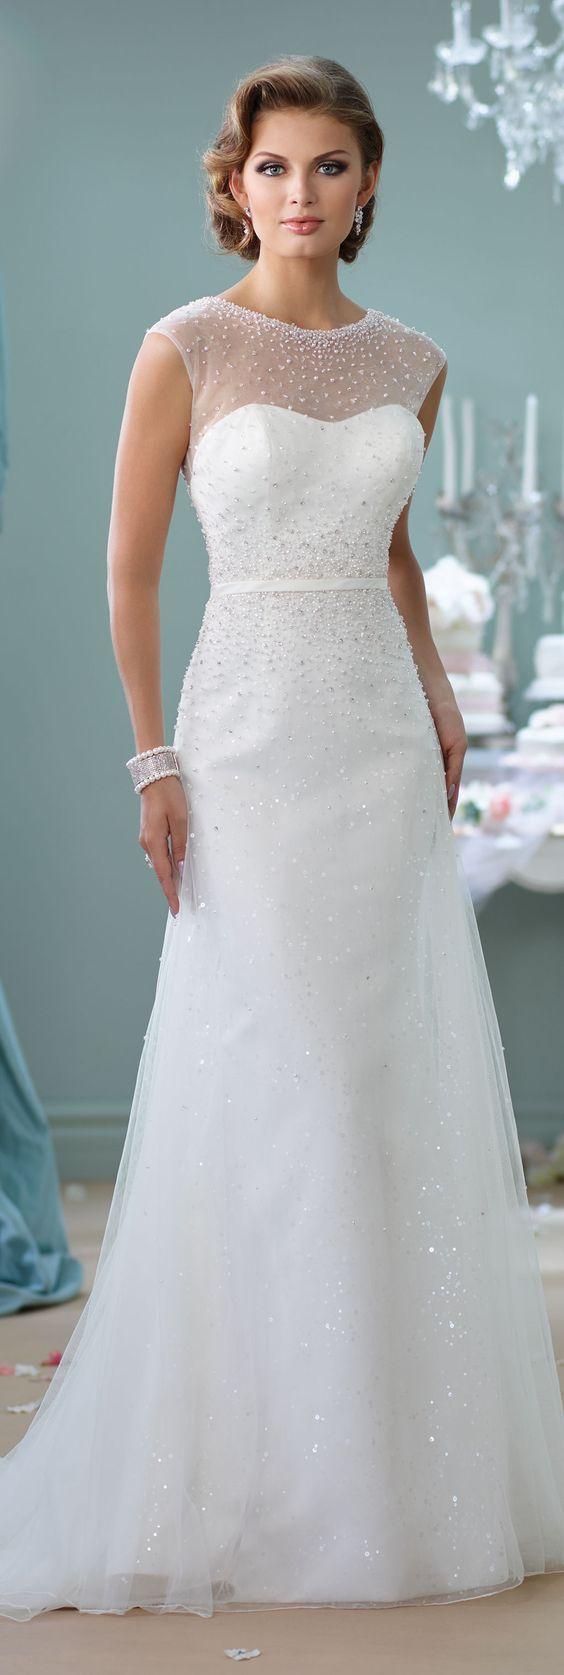 http://www.aliexpress.com/store/group/New-Arrival-Wedding-Dresses/1488609_259107194.html